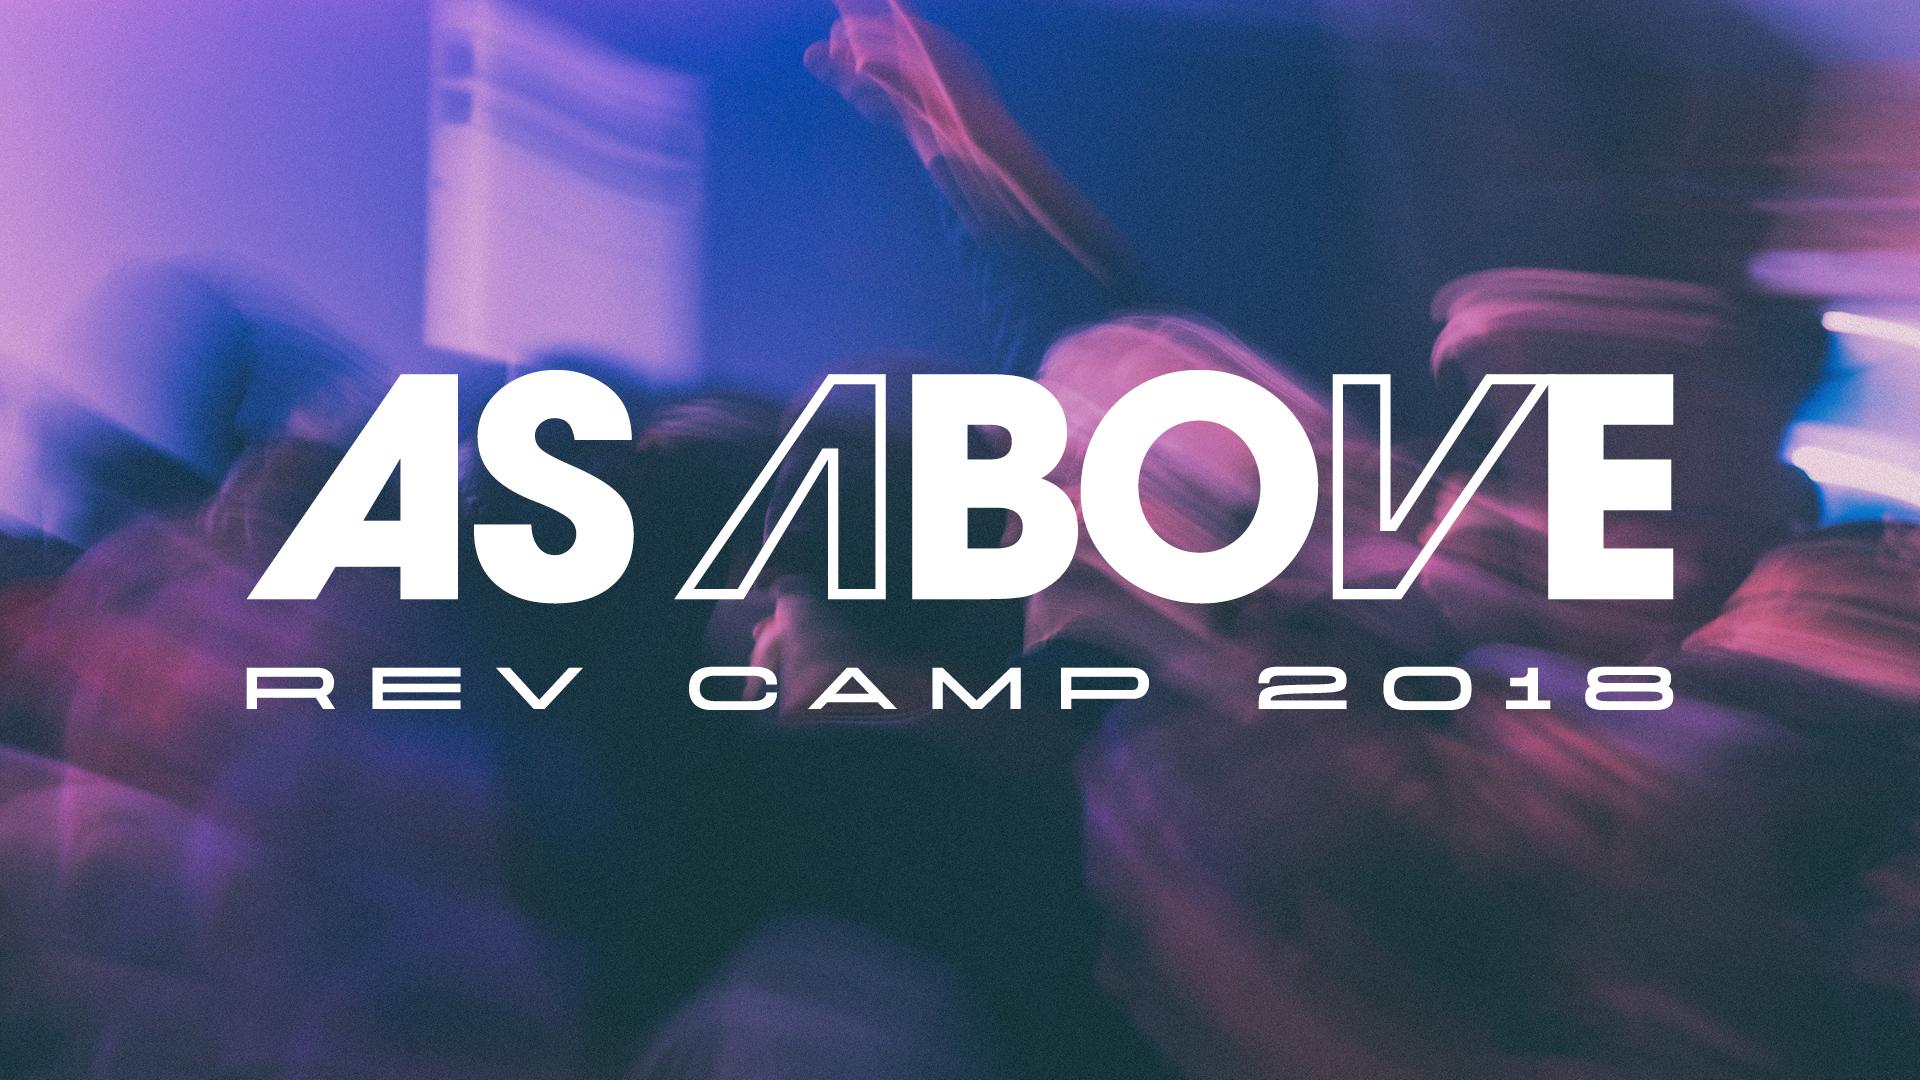 Rev Camp 2018 As Above Generic Slides7.jpg